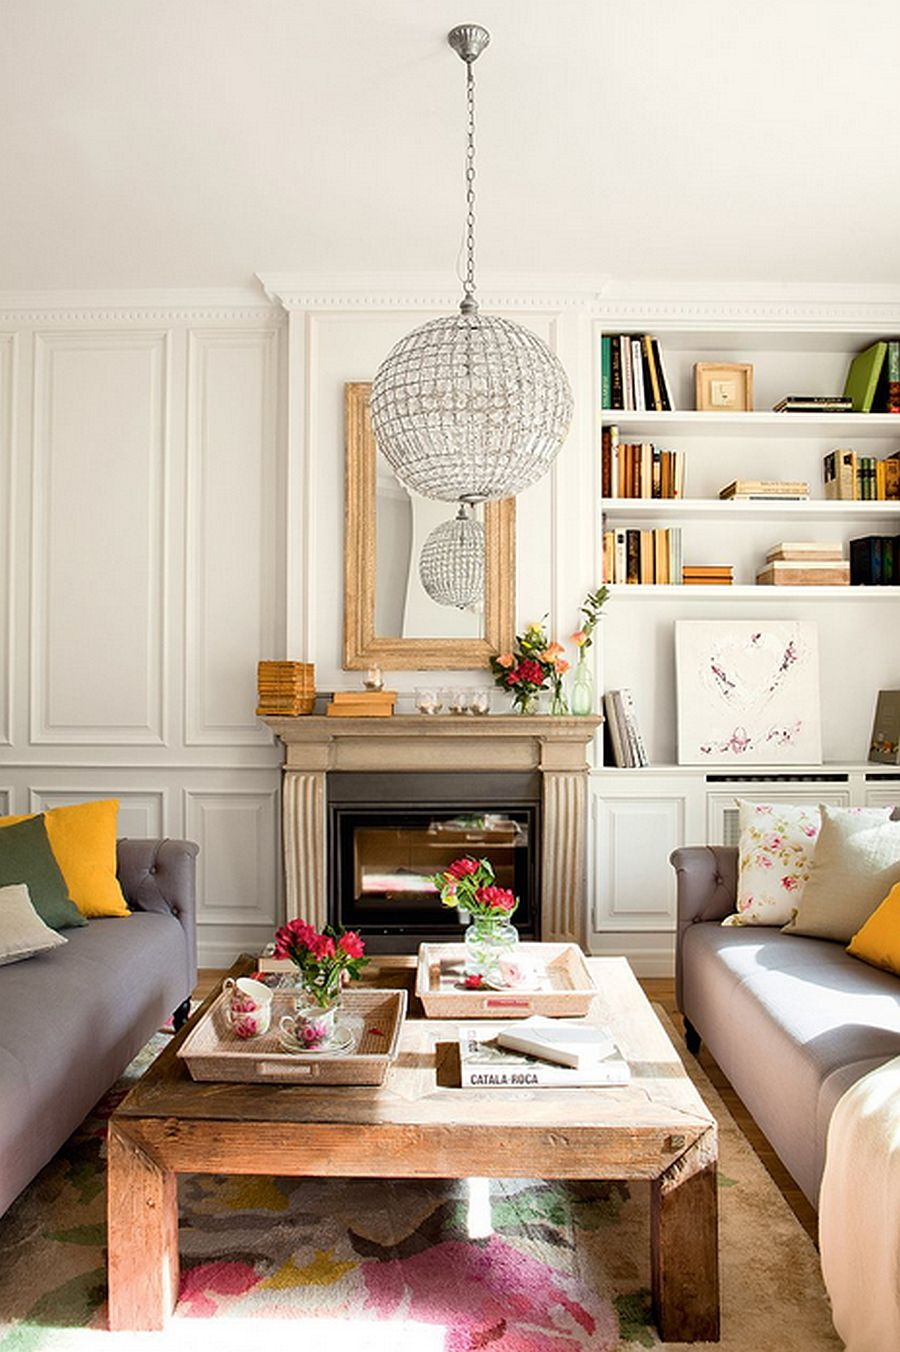 adelaparvu.com despre renovare apartament in cladire veche, casa Barcelona, designer Meritxell Ribe (6)